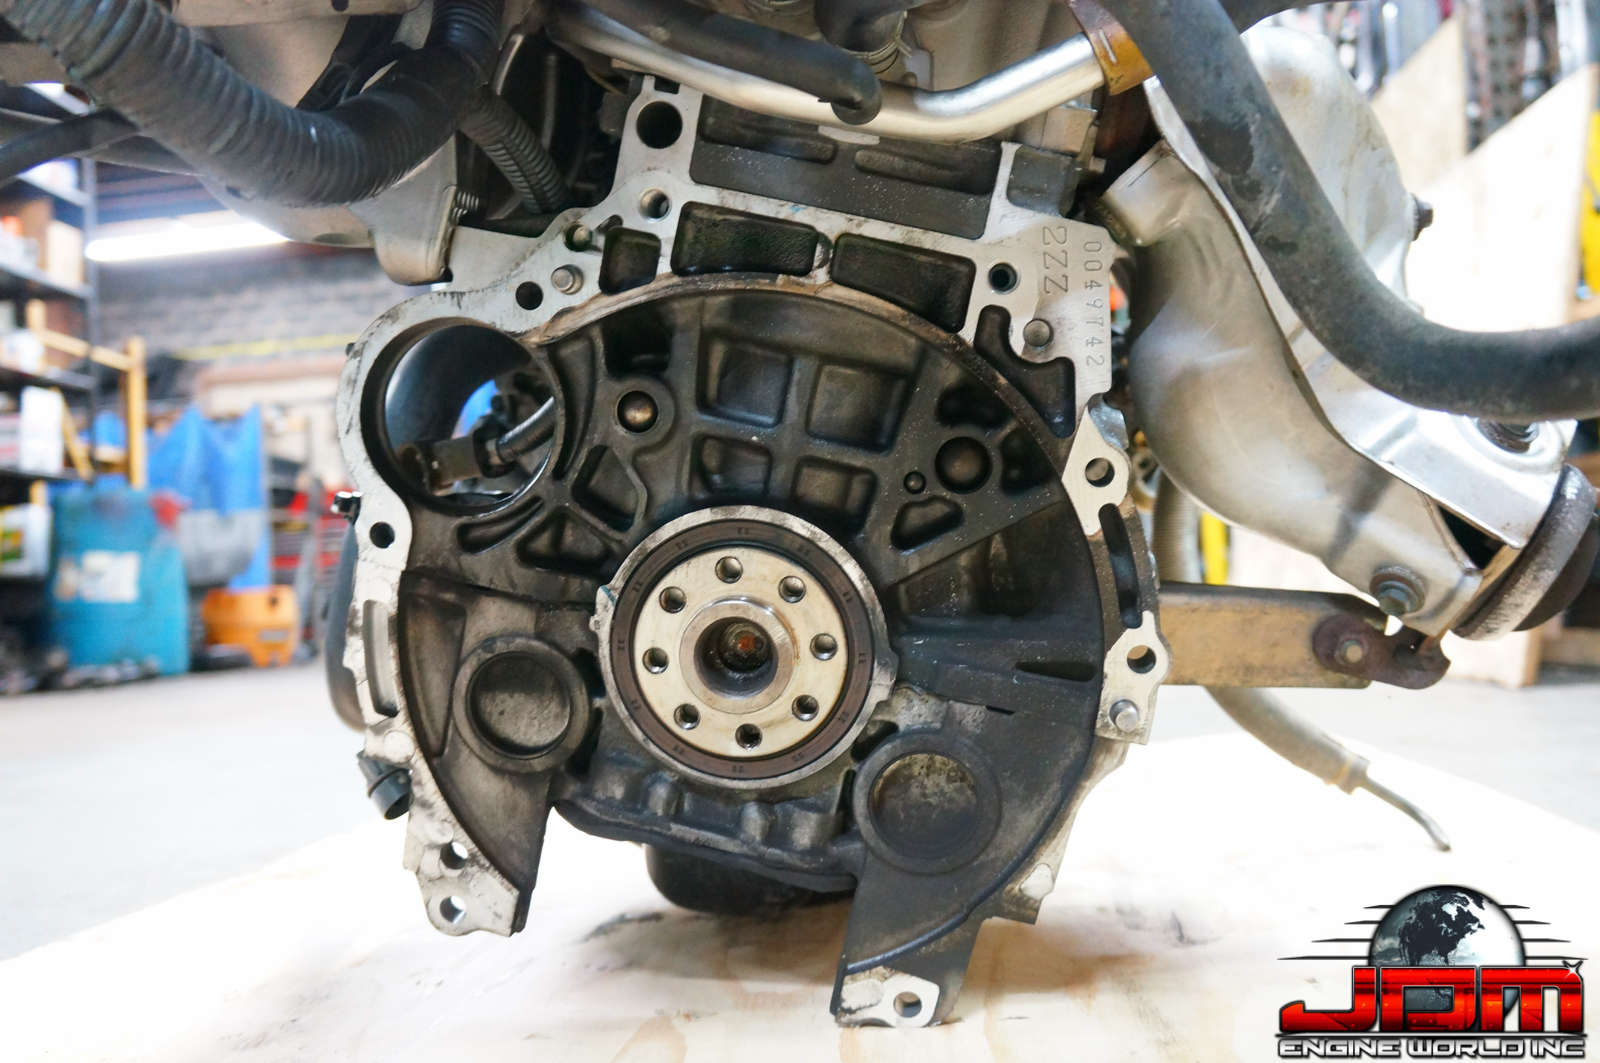 03-06 TOYOTA MATRIX XRS 2ZZ-GE ENGINE VVTLi 1.8L JDM 2ZZ